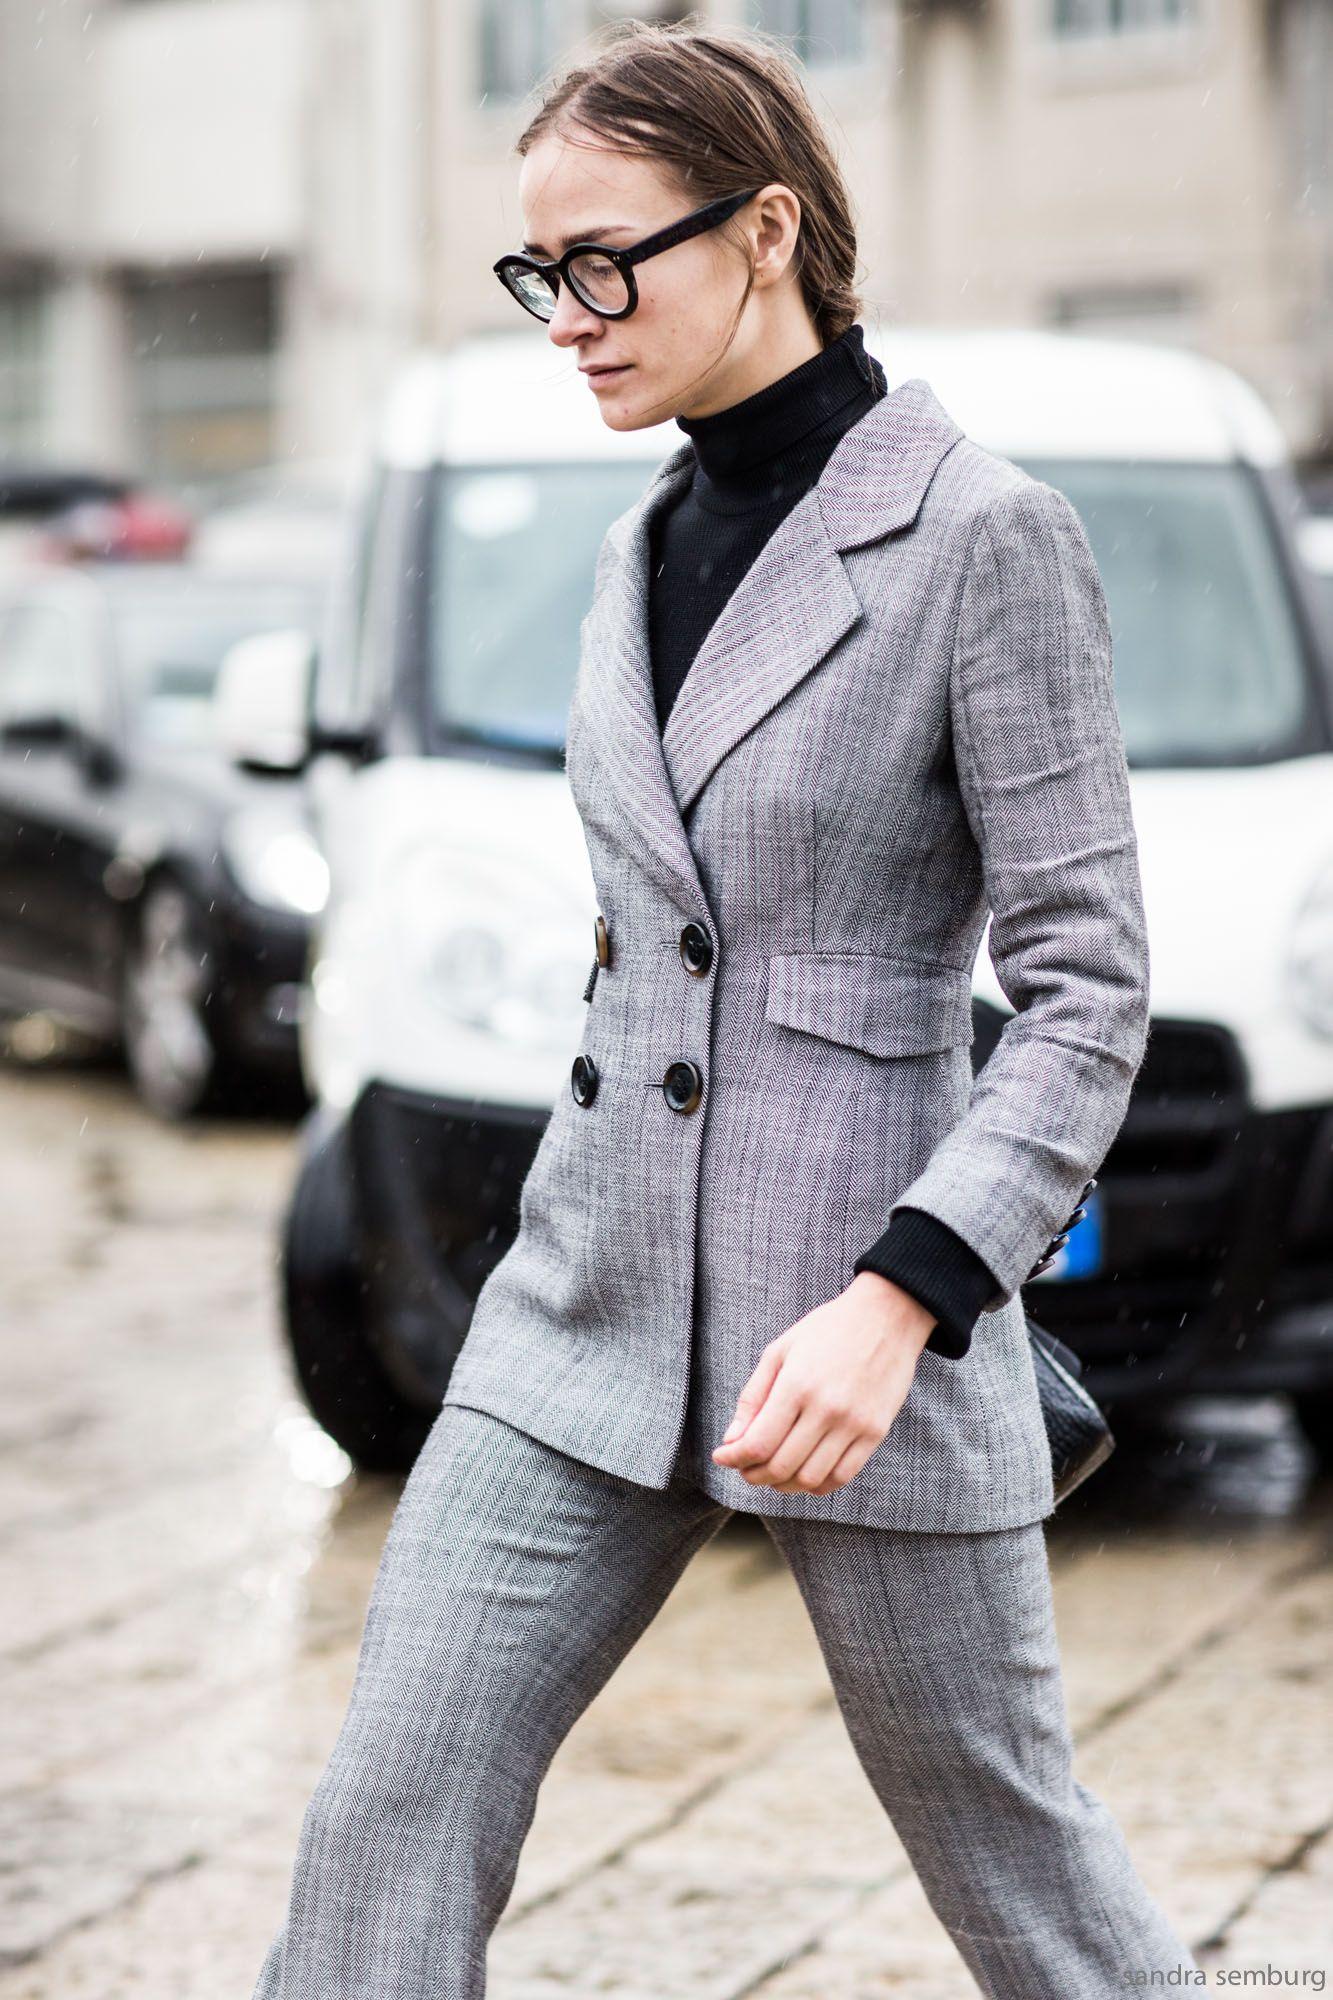 milan fashion week september 2015 settembre milano gucci-20150923-8698